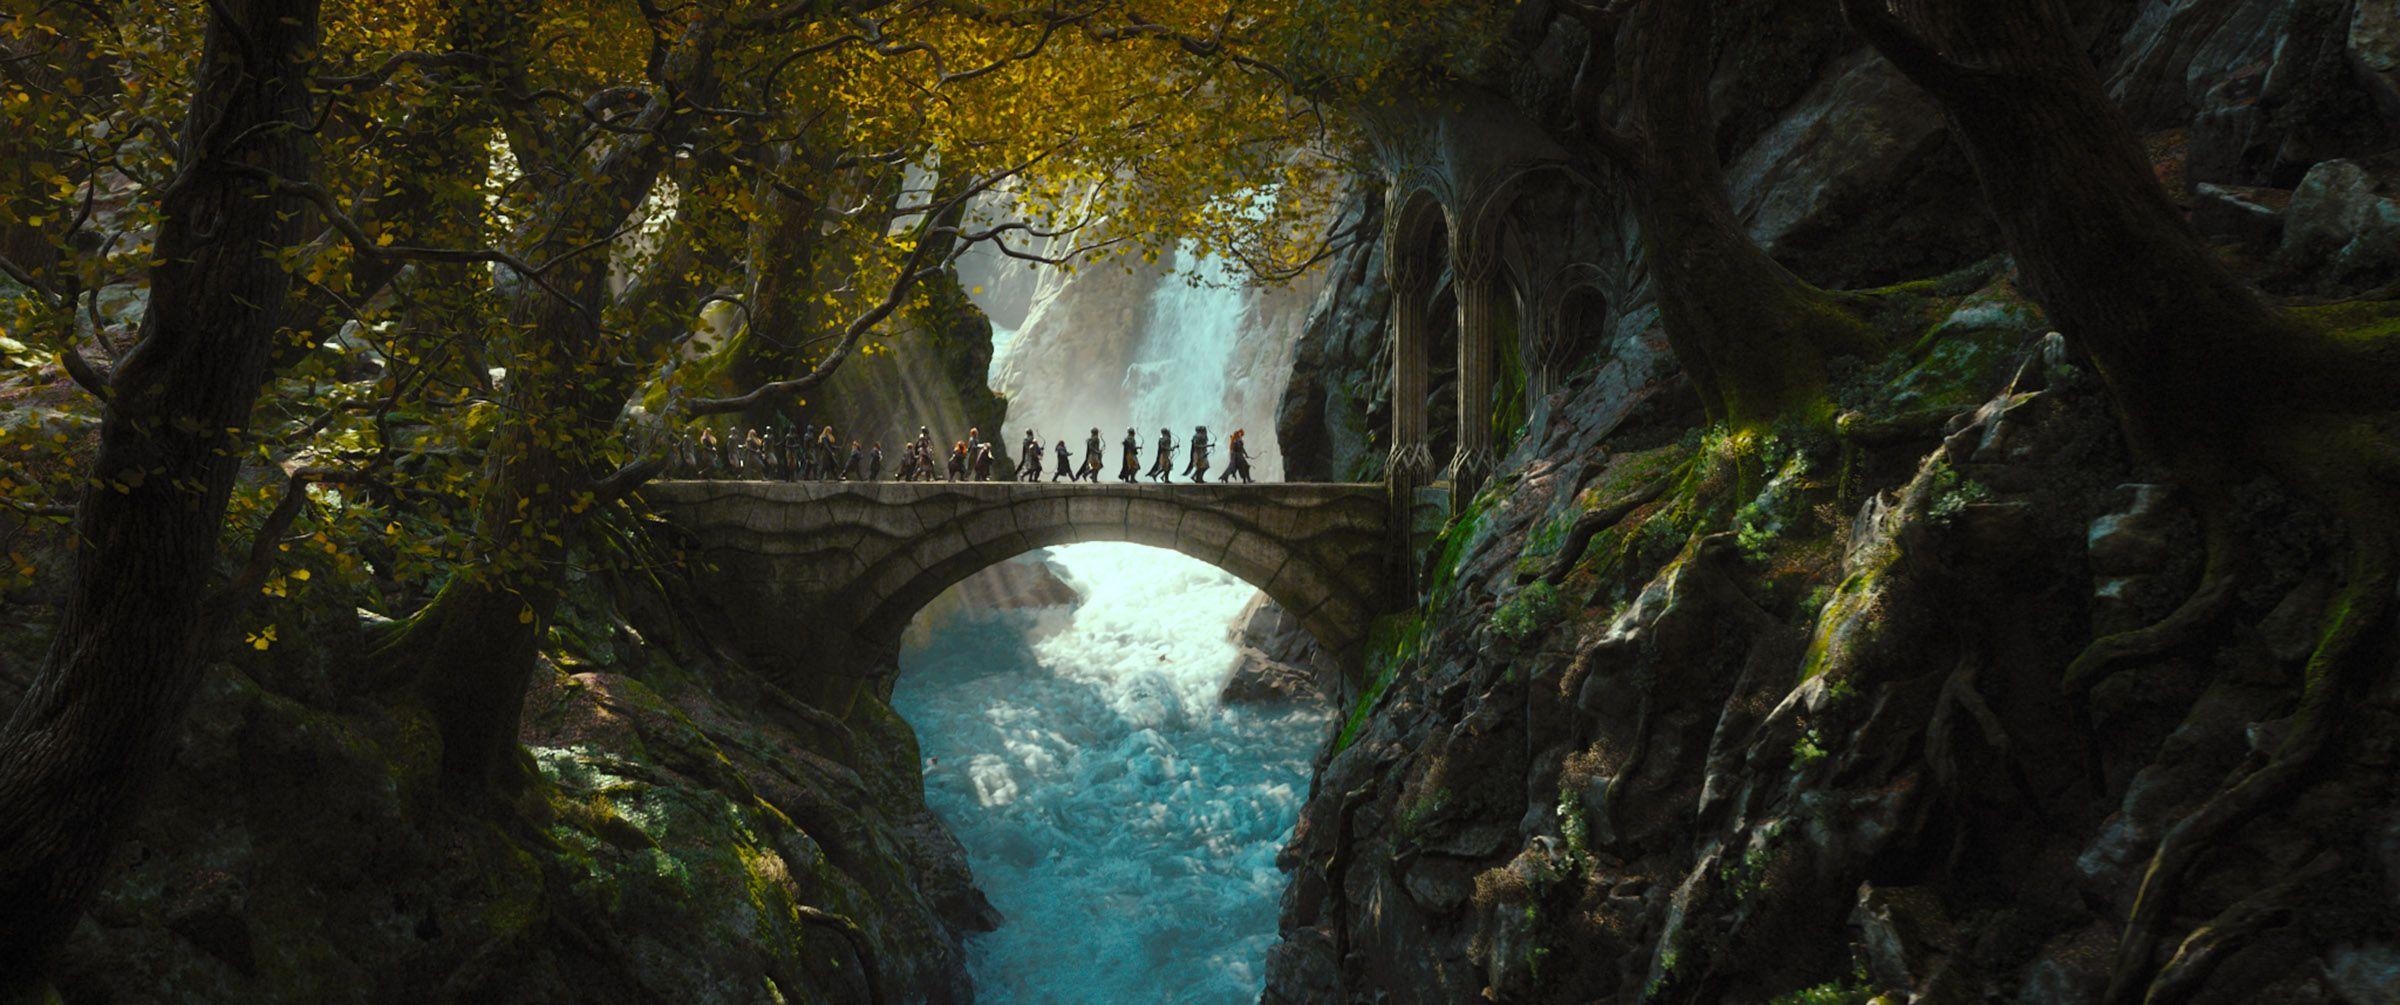 The Hobbit (filmtrilogie) - Wikipedia